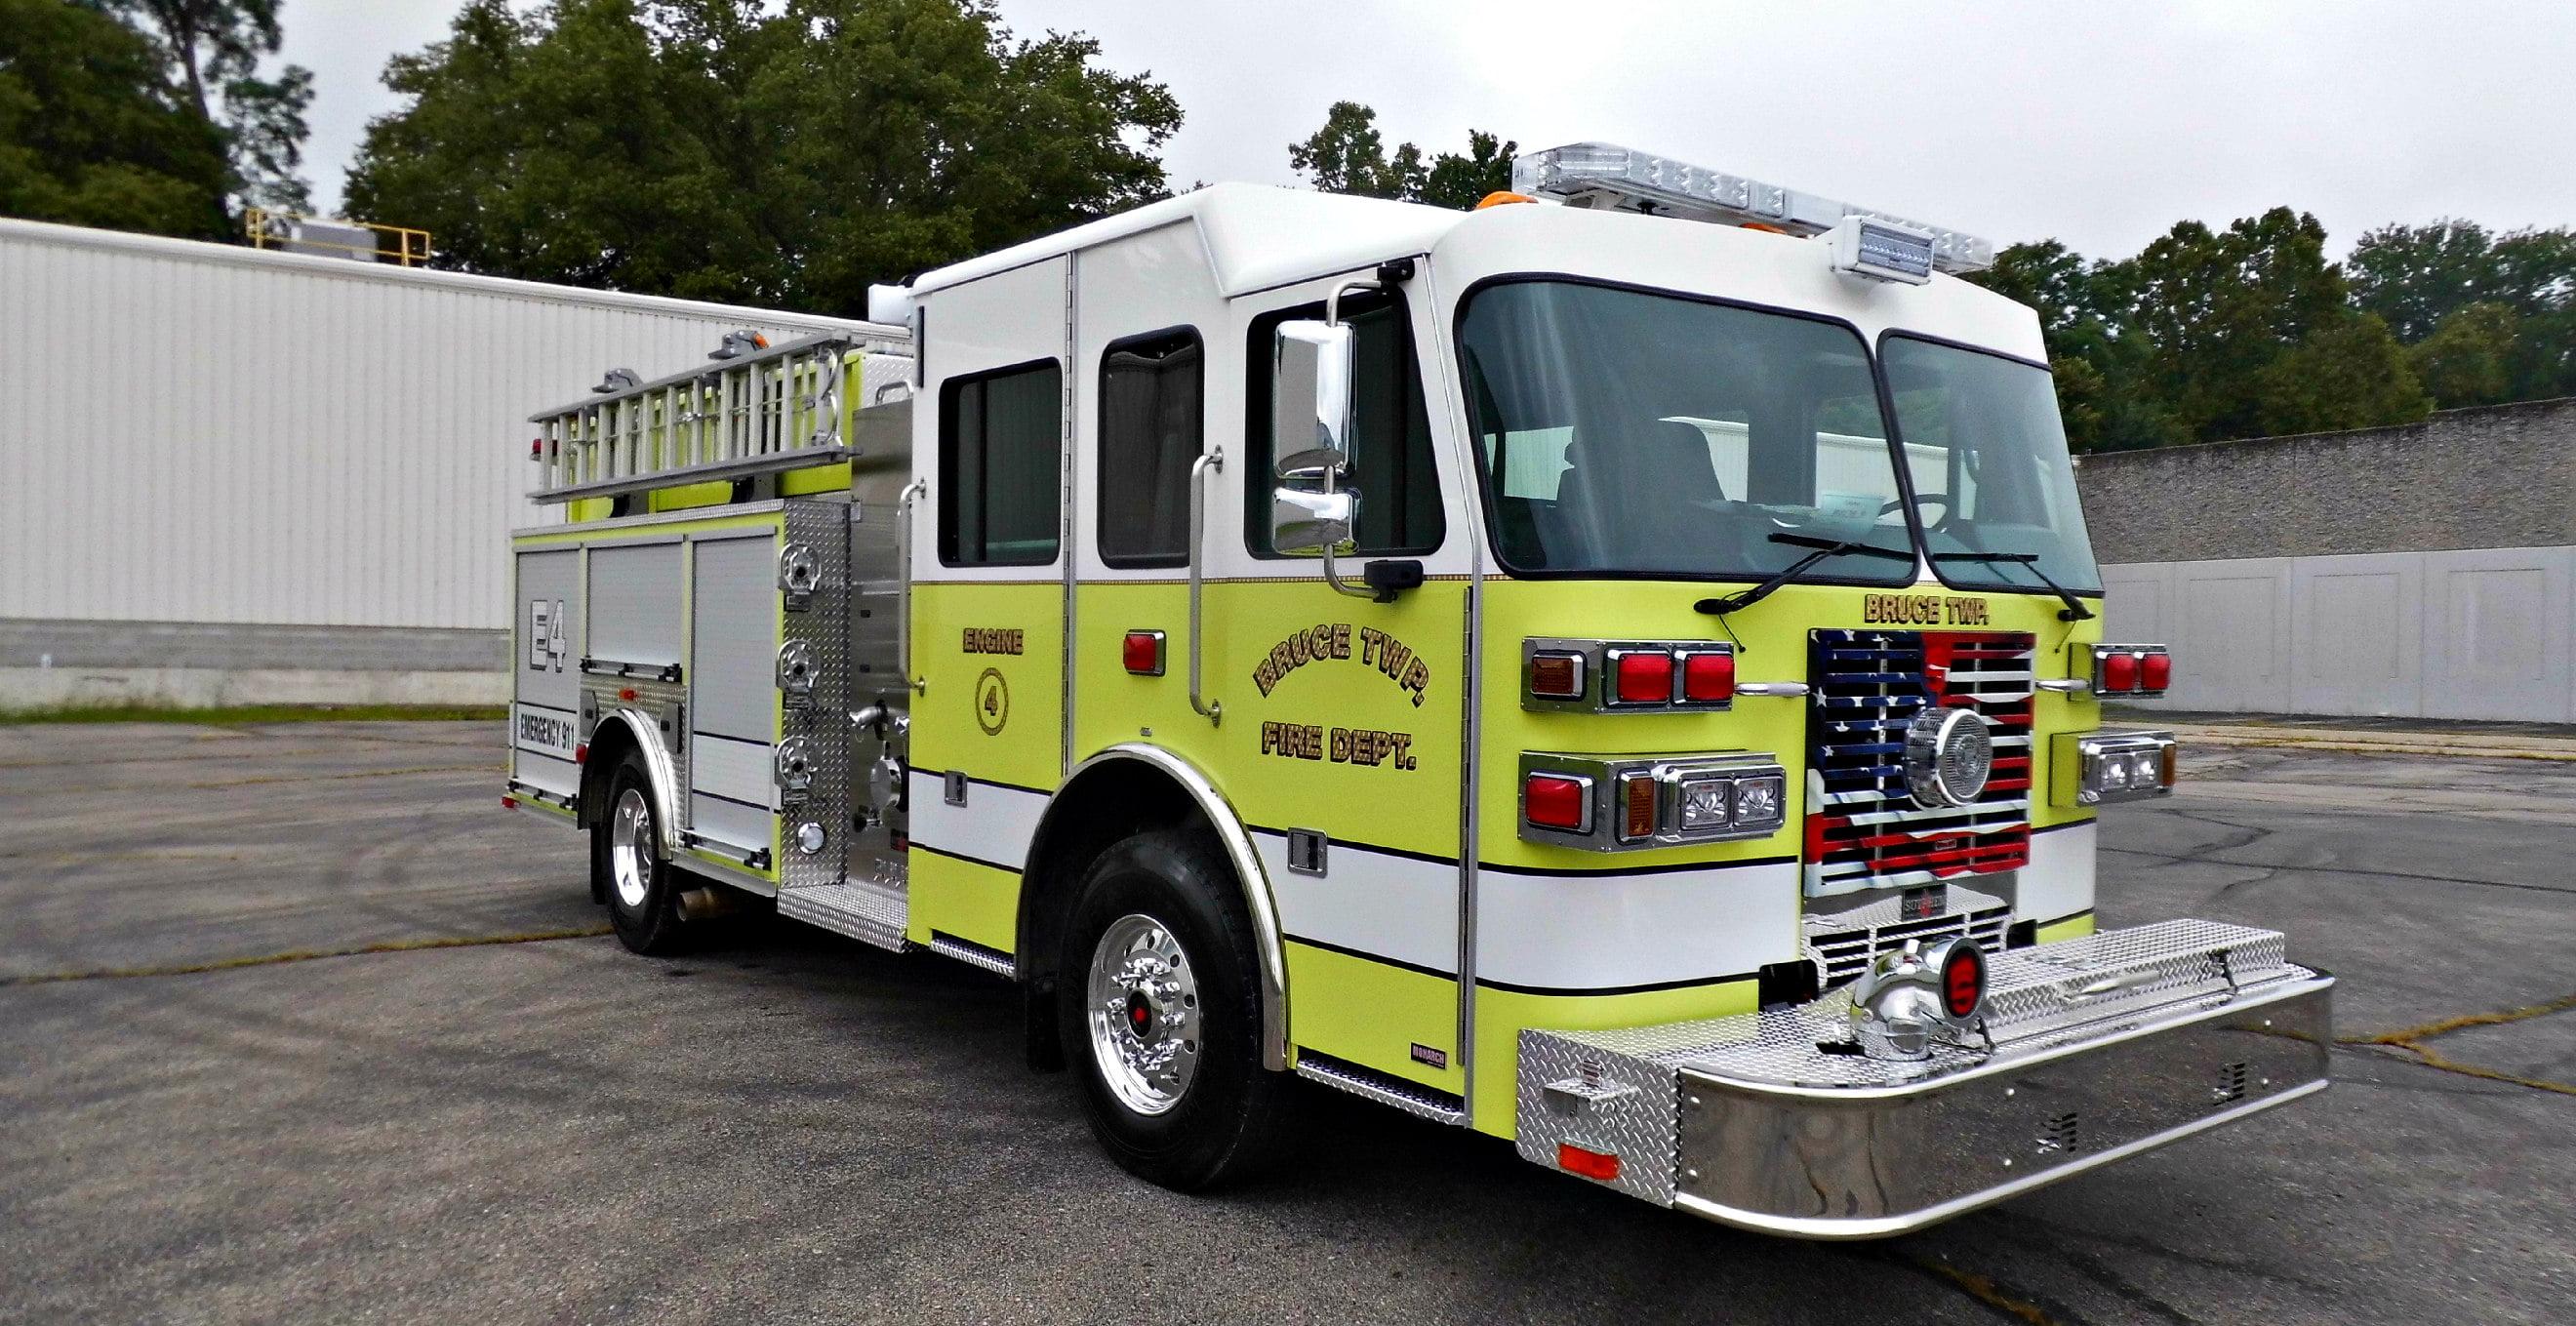 Bruce Township Fire Department